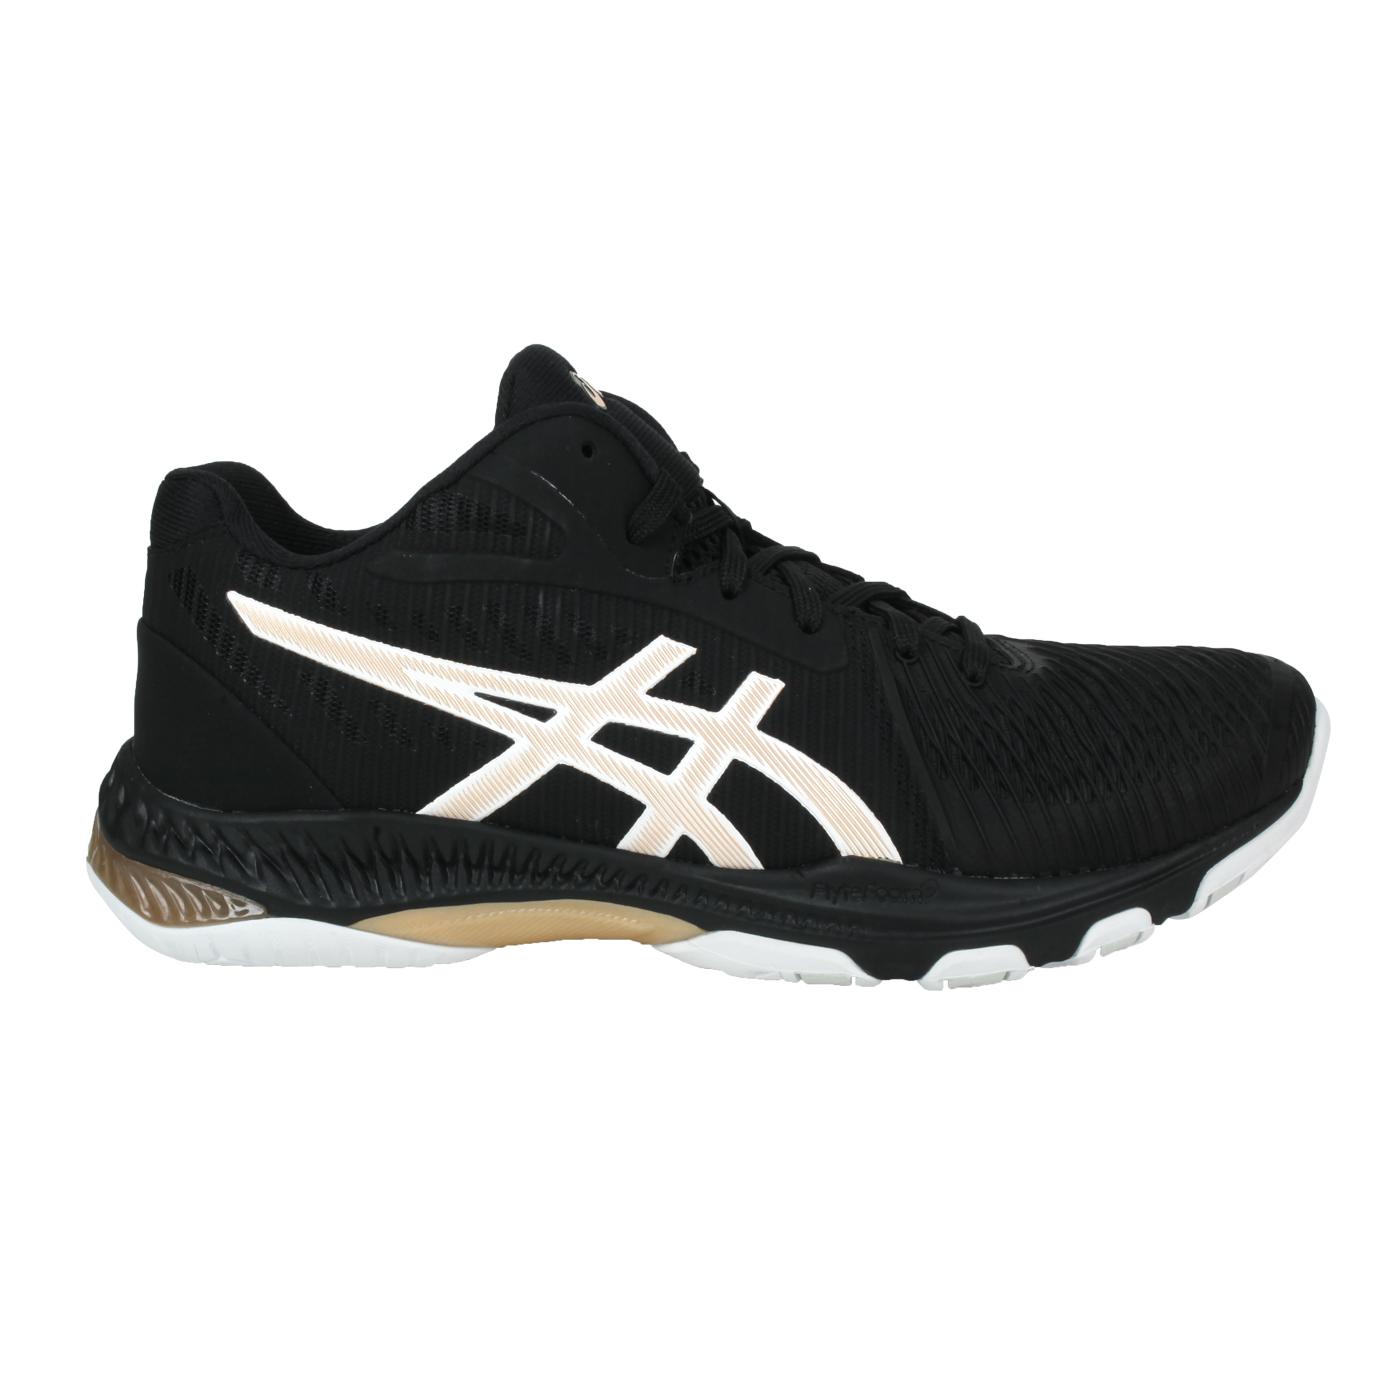 ASICS 男款排羽球鞋  @NETBURNER BALLISTIC FF MT 2@1051A042-003 - 黑金